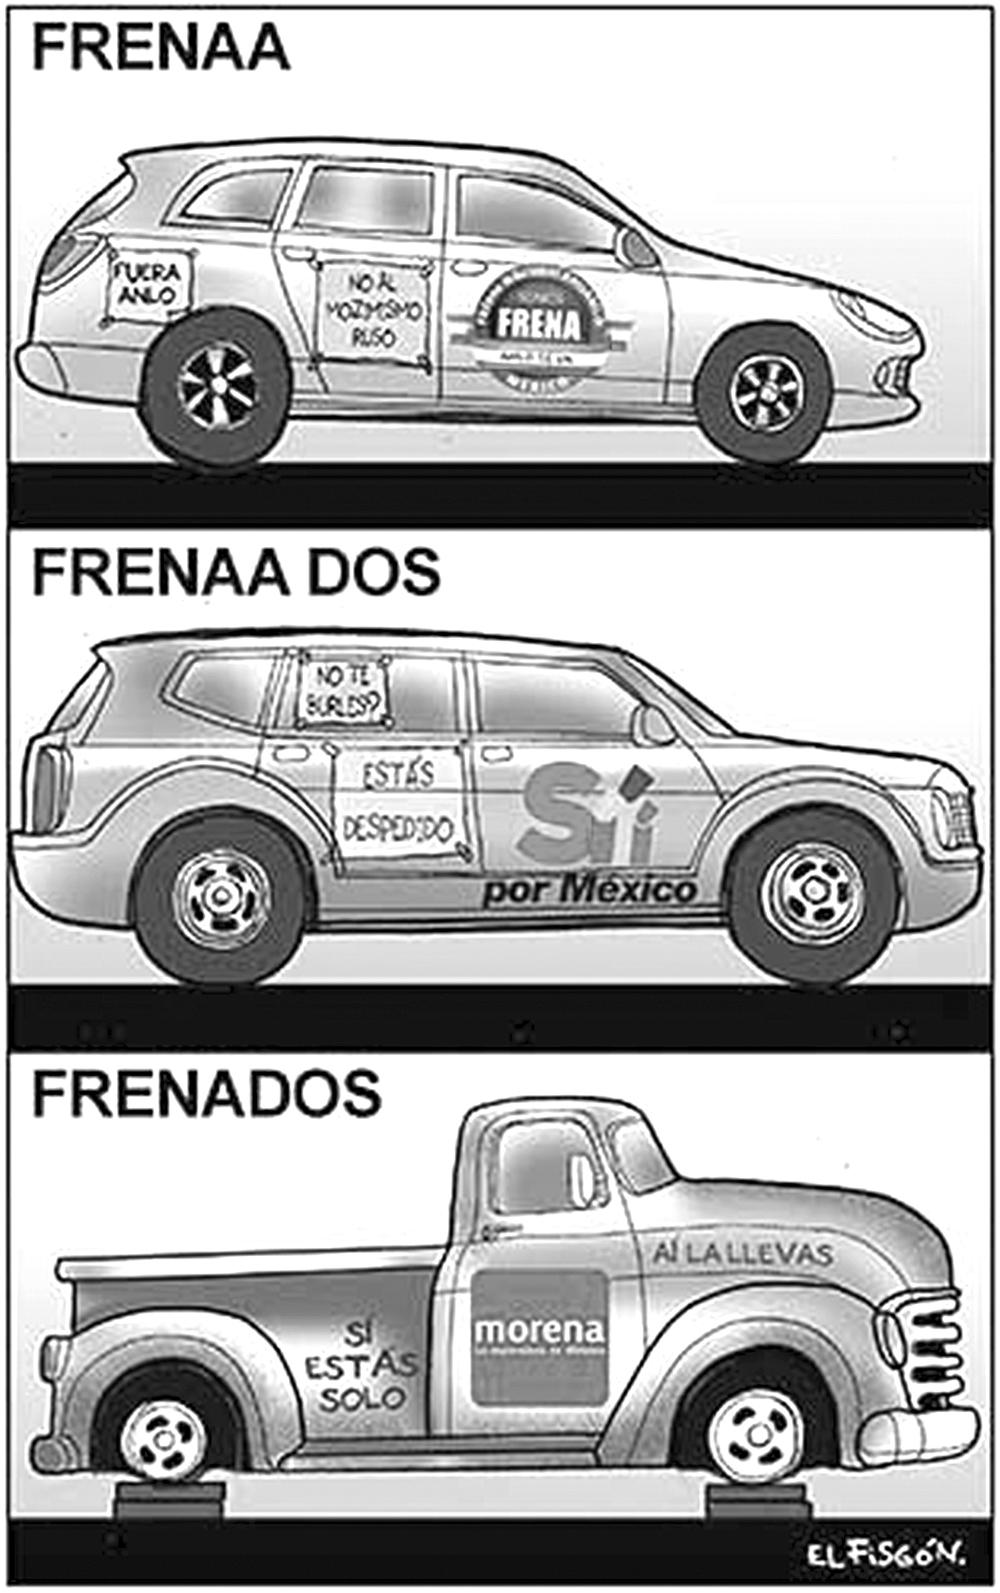 COSAS QUE NO CAMINAN-Fisgón